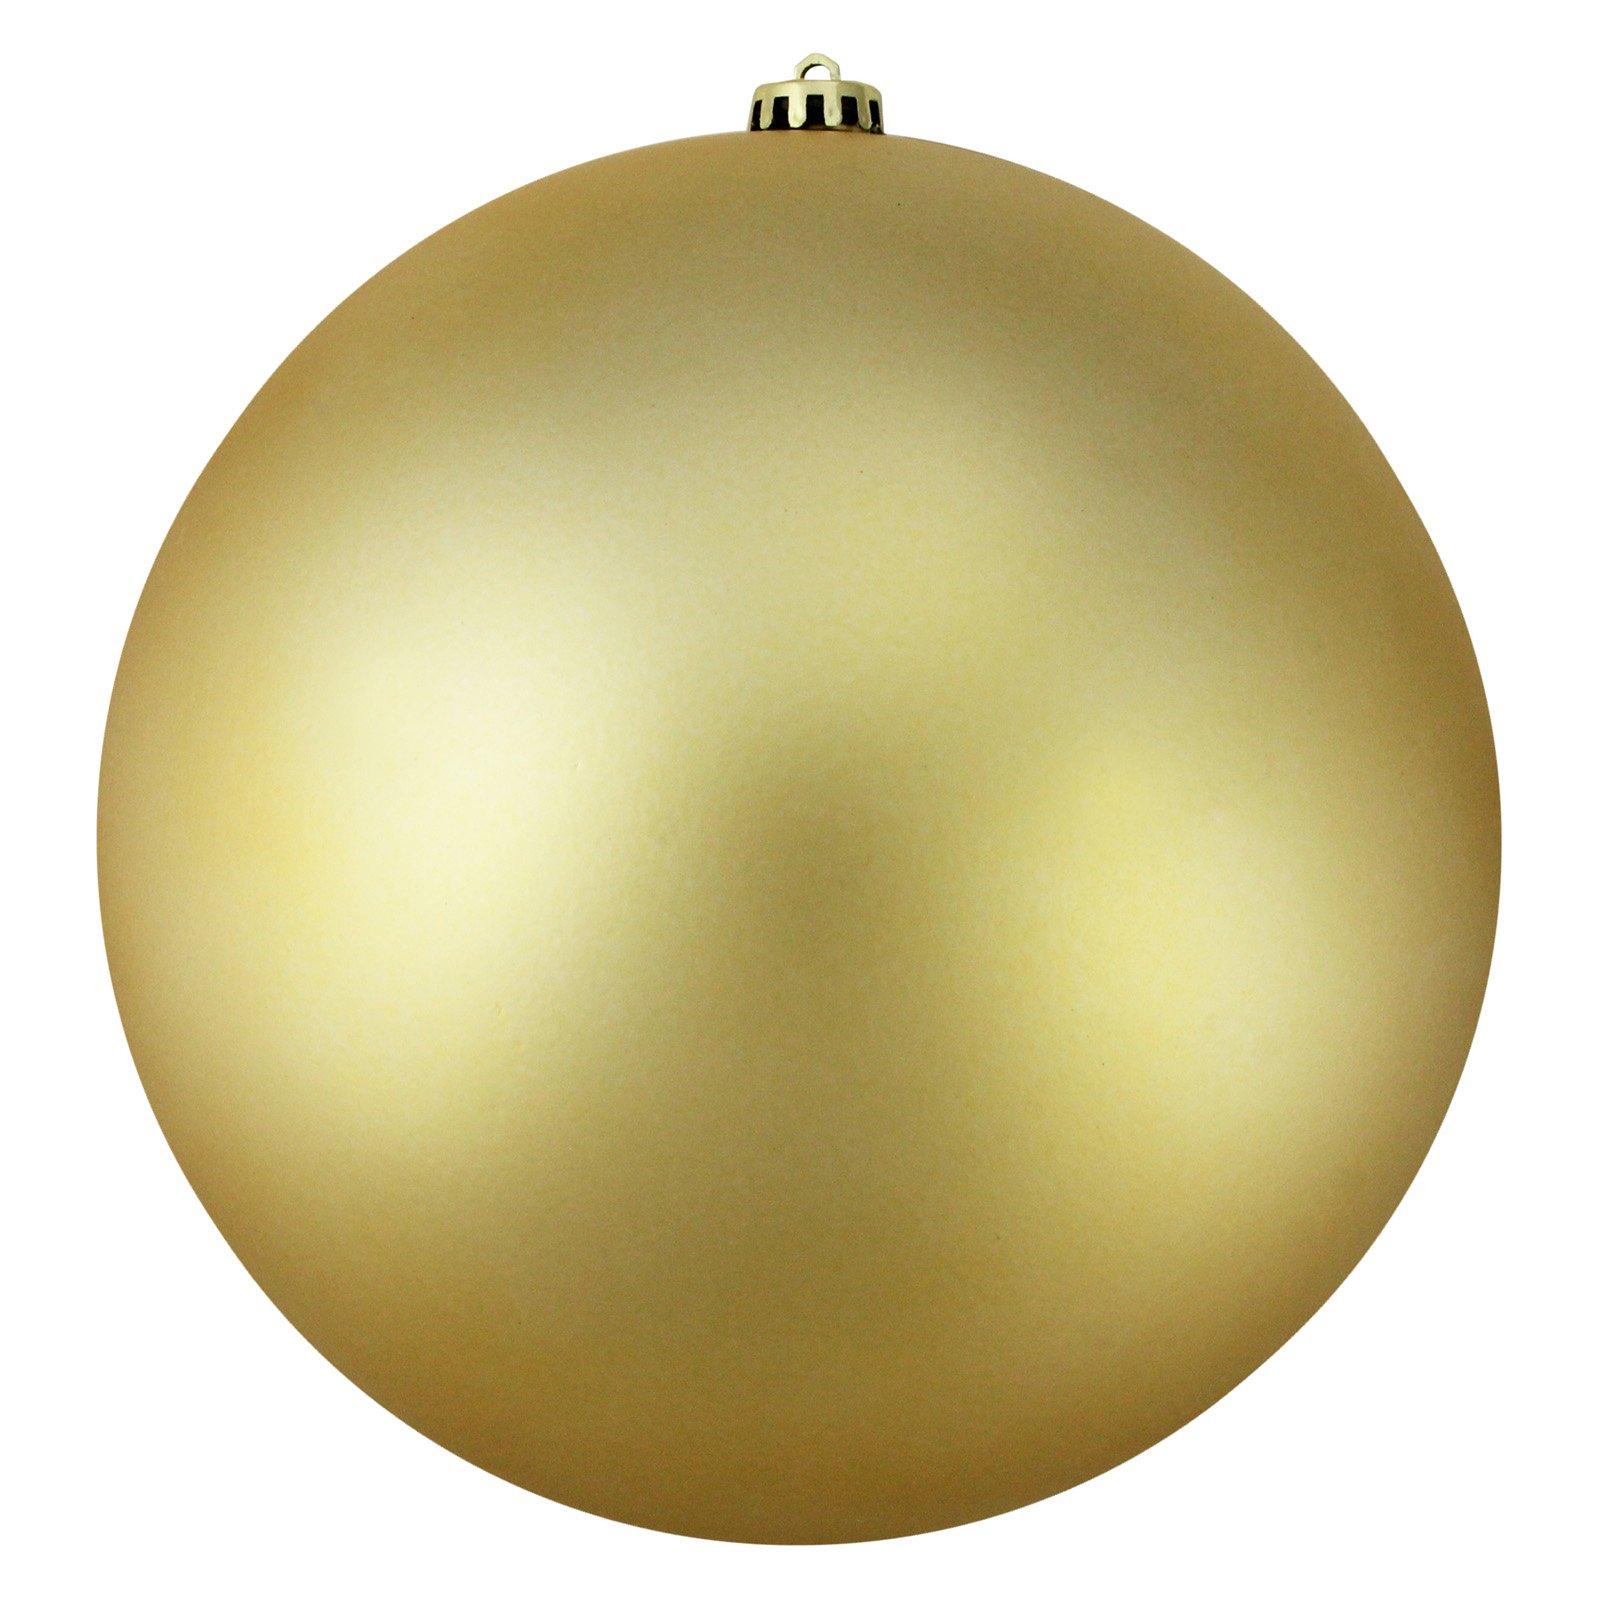 Northlight Shatterproof Matte UV Resistant 8 in. Christmas Ball Ornament